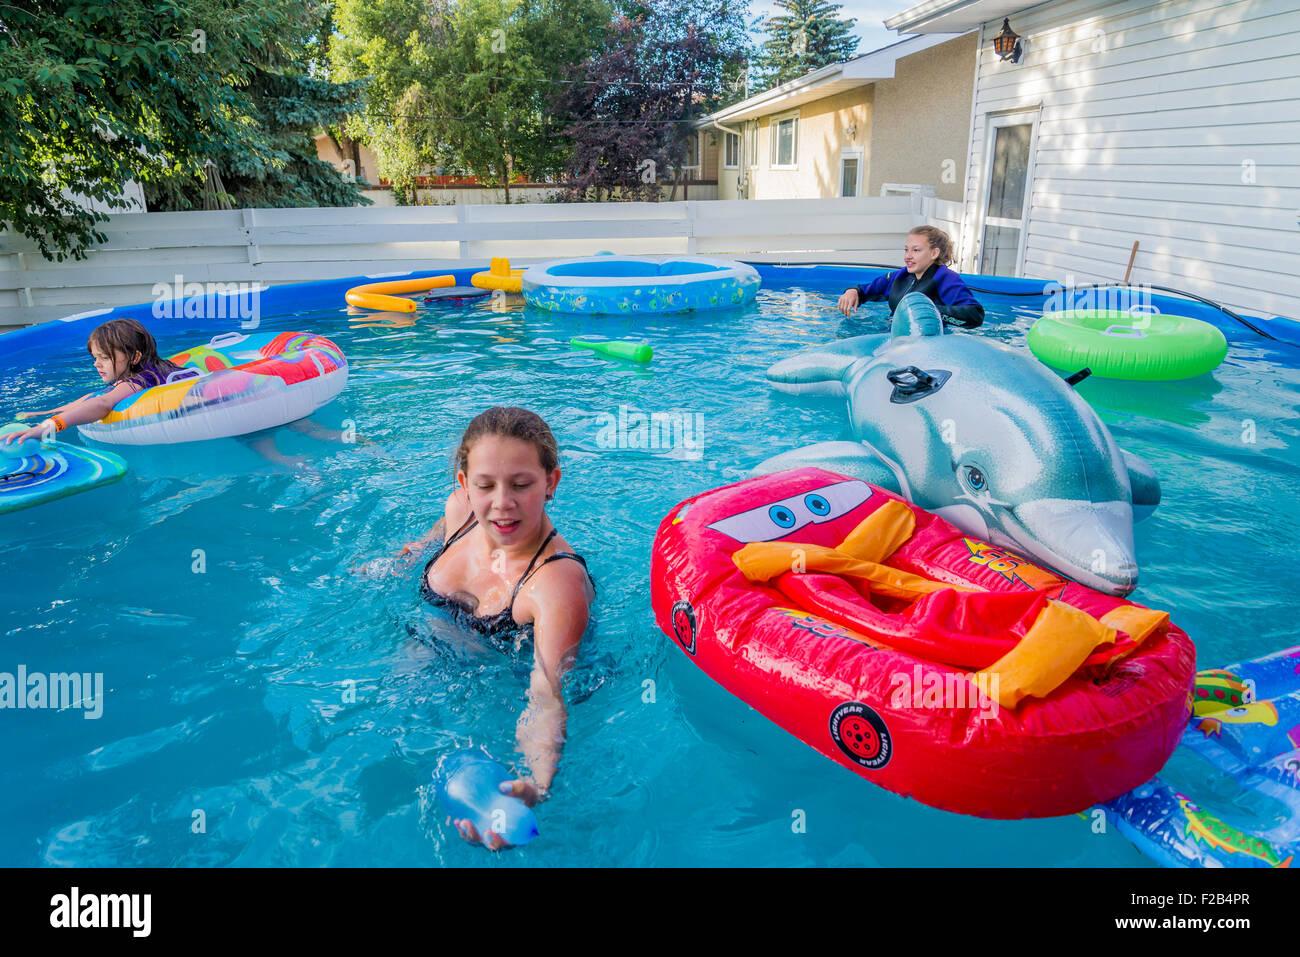 Girls in above ground backyard swimming pool. - Stock Image